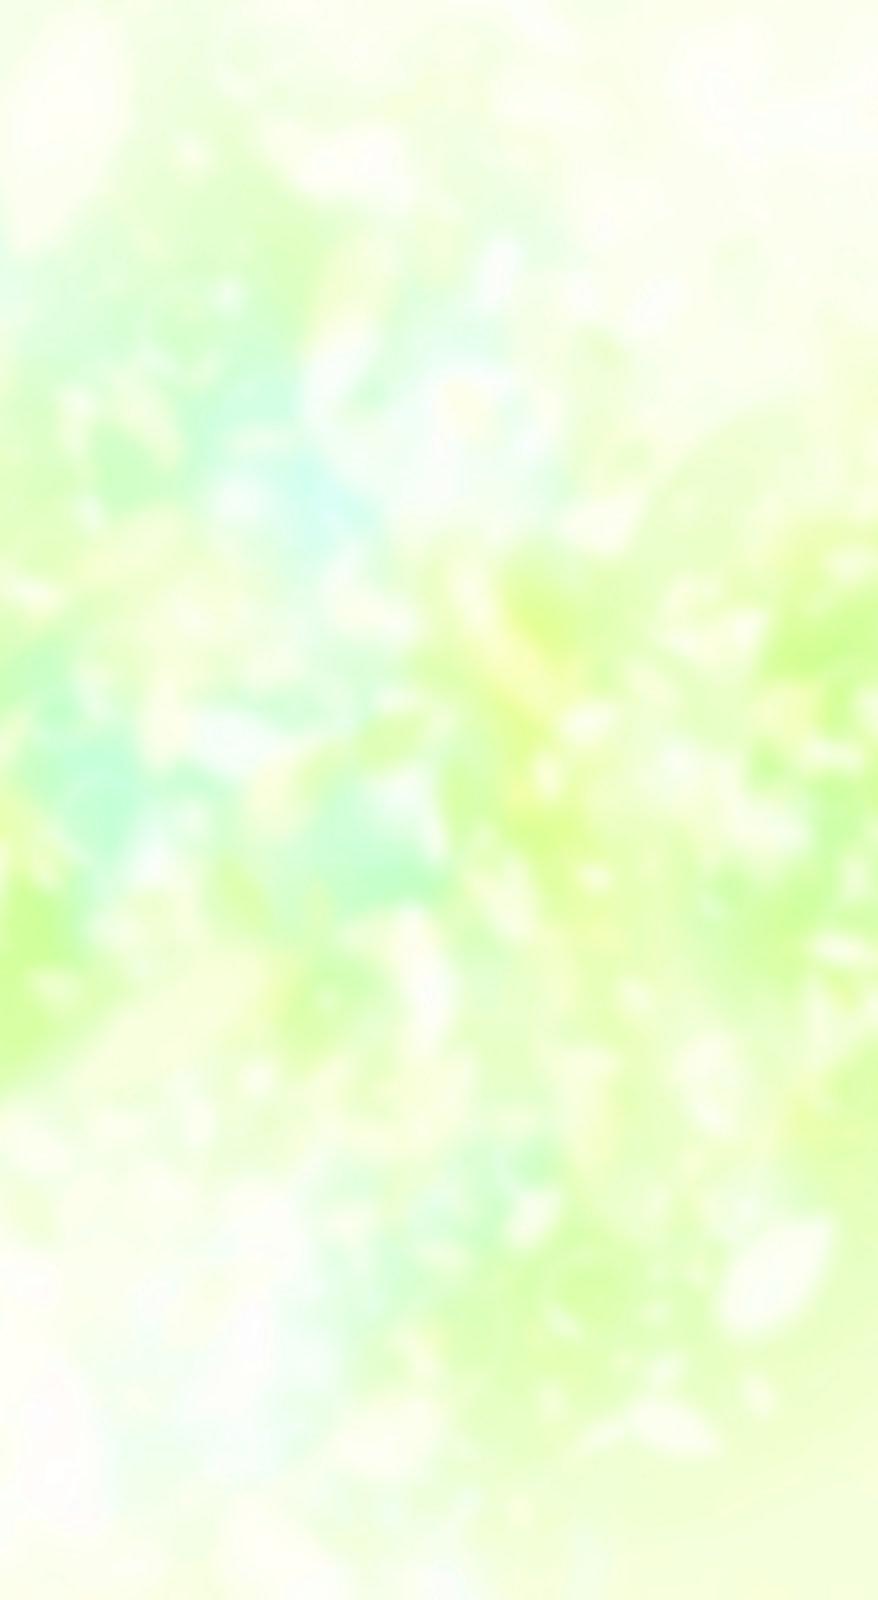 image611-1600x1200 - コピー (2).jpg